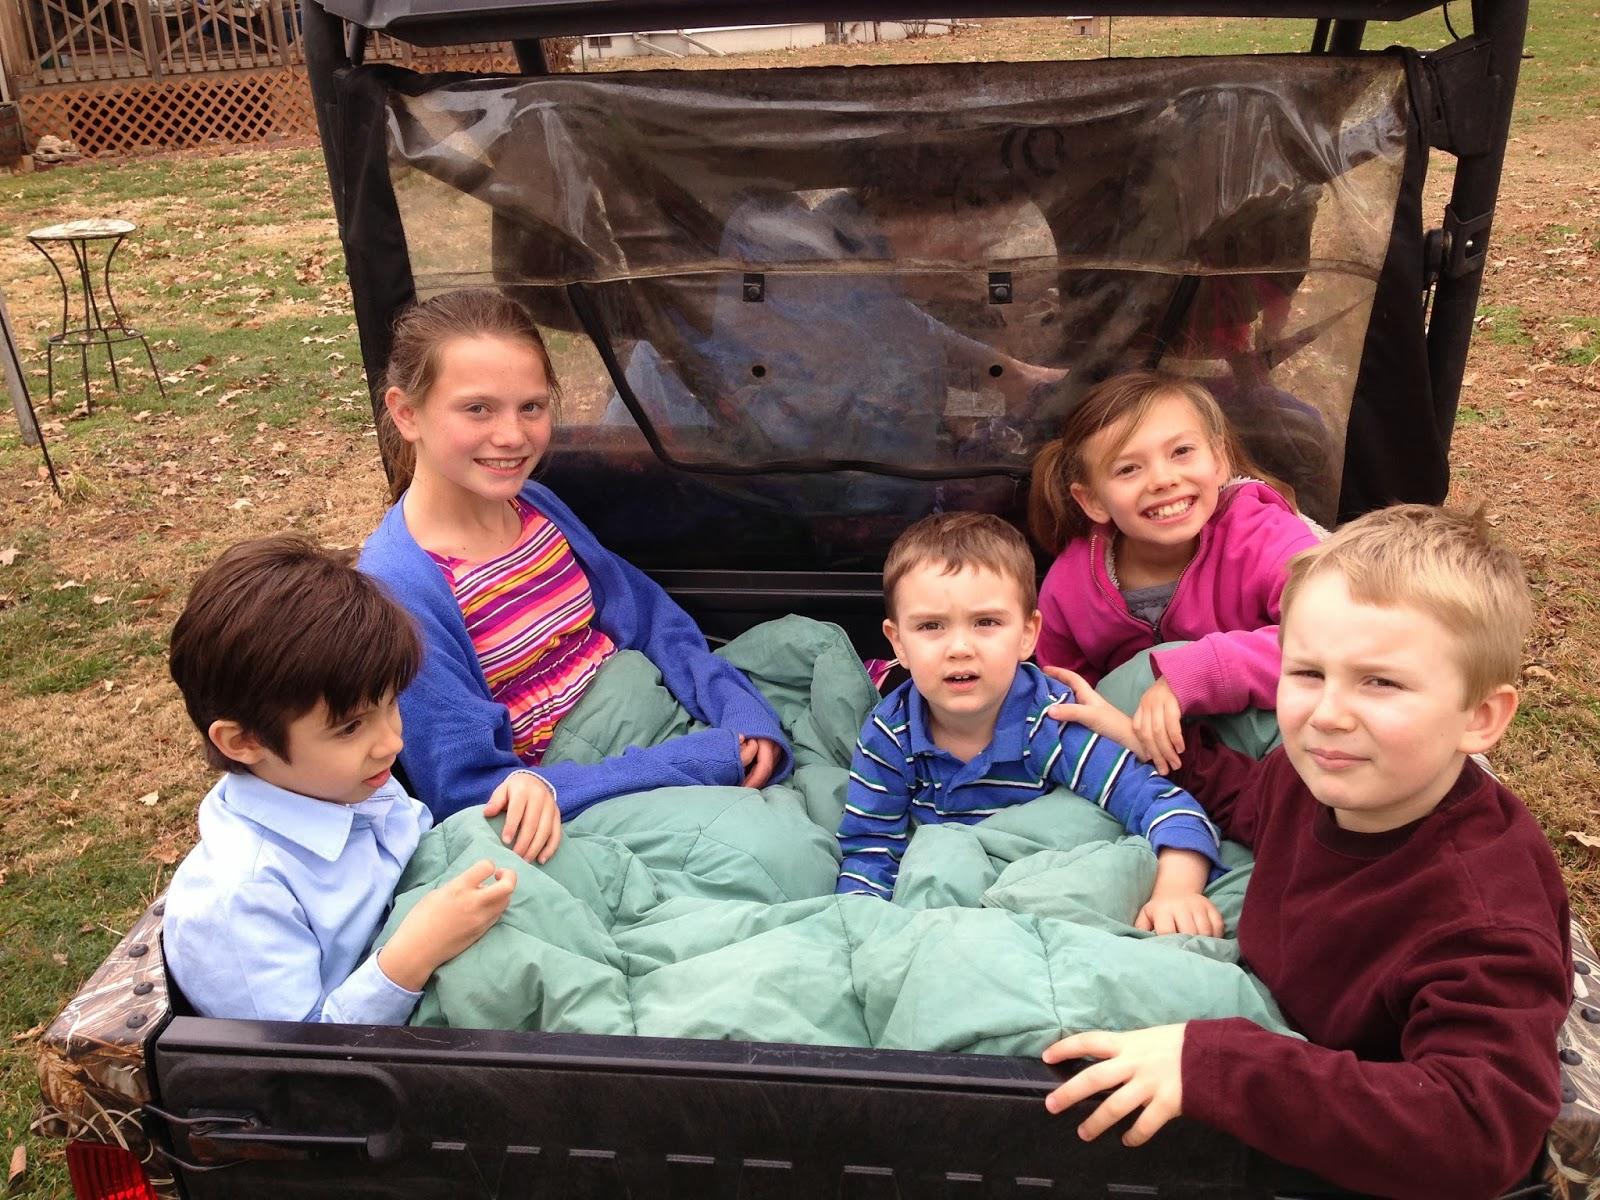 off-road vehicle, kids smiling, farm